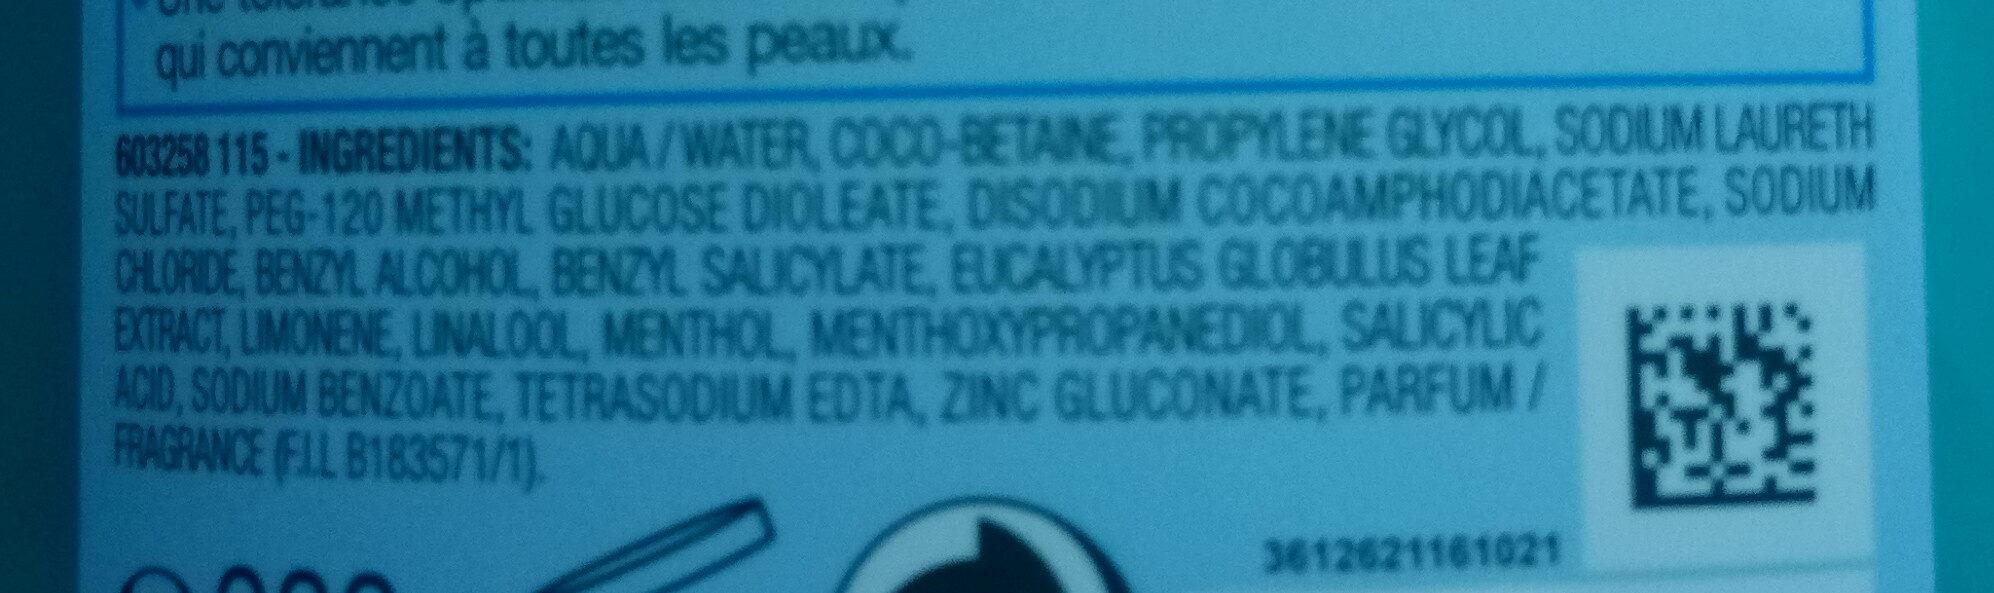 Pure Active Gel Nettoyant Purifiant - Ingredients